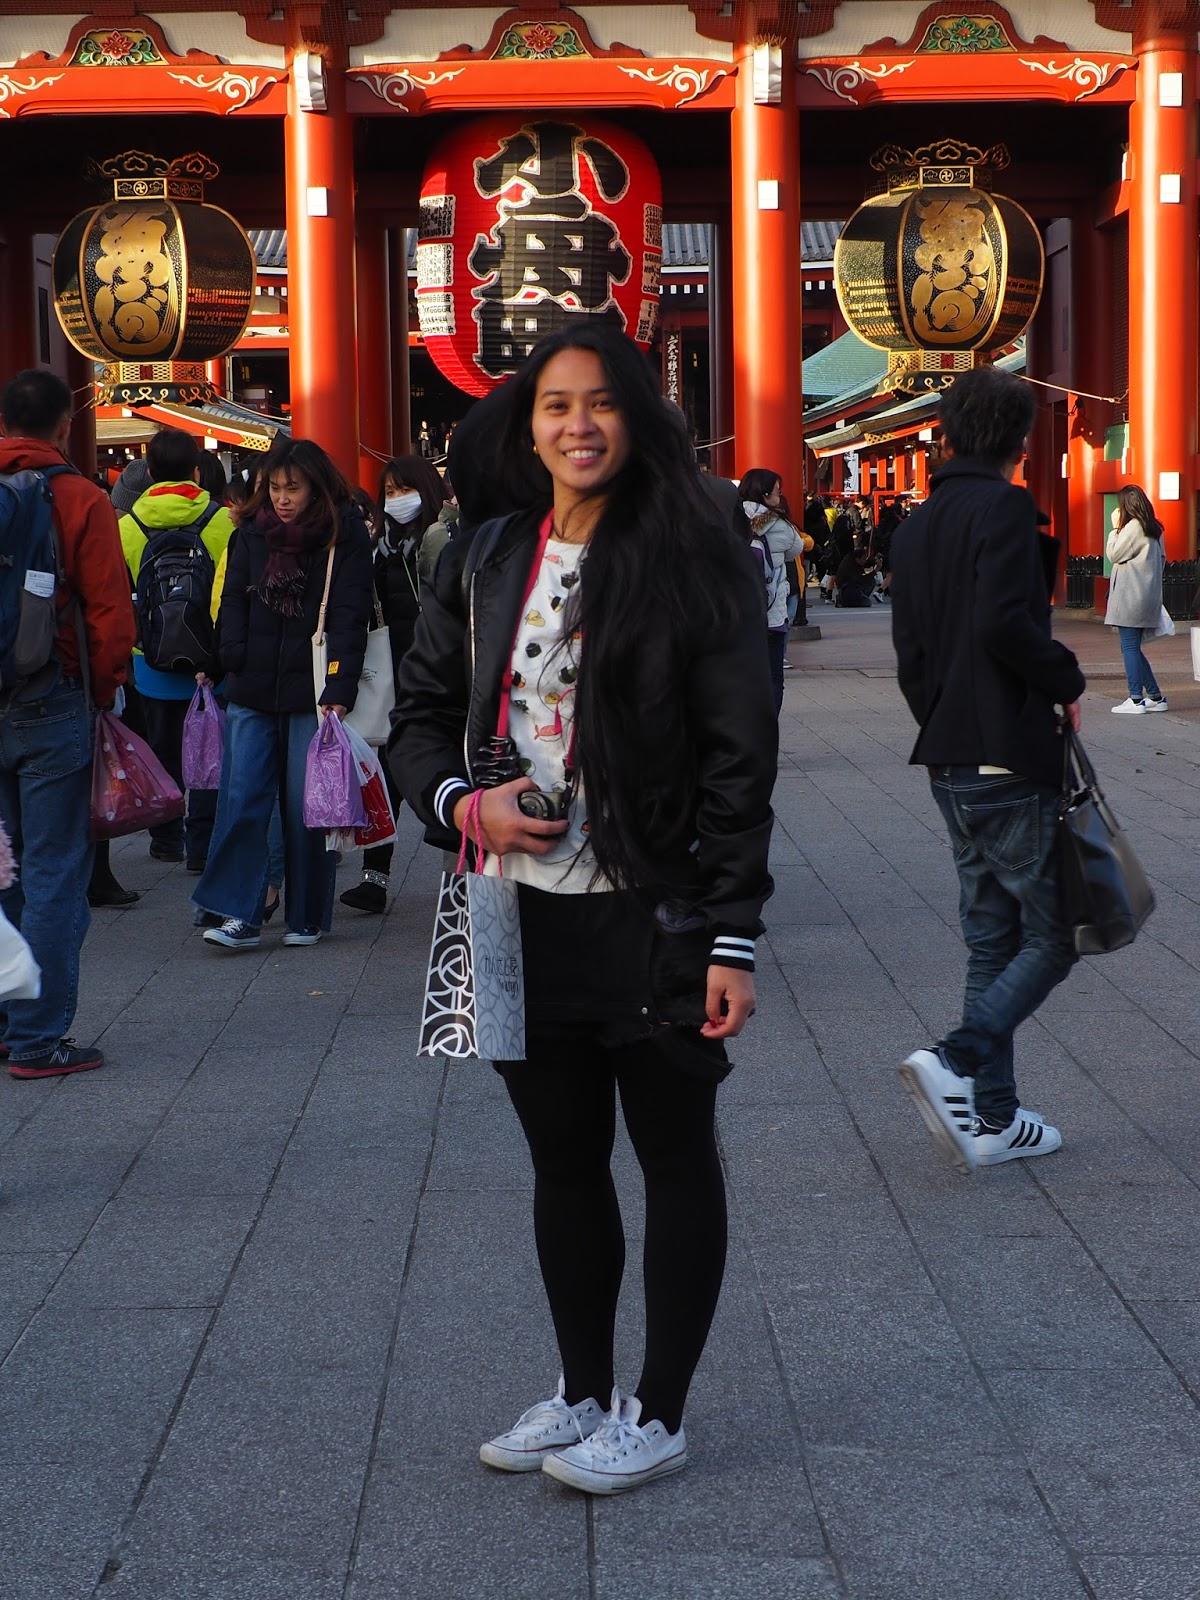 sensoji buddhist temple outfit fashion japan tokyo